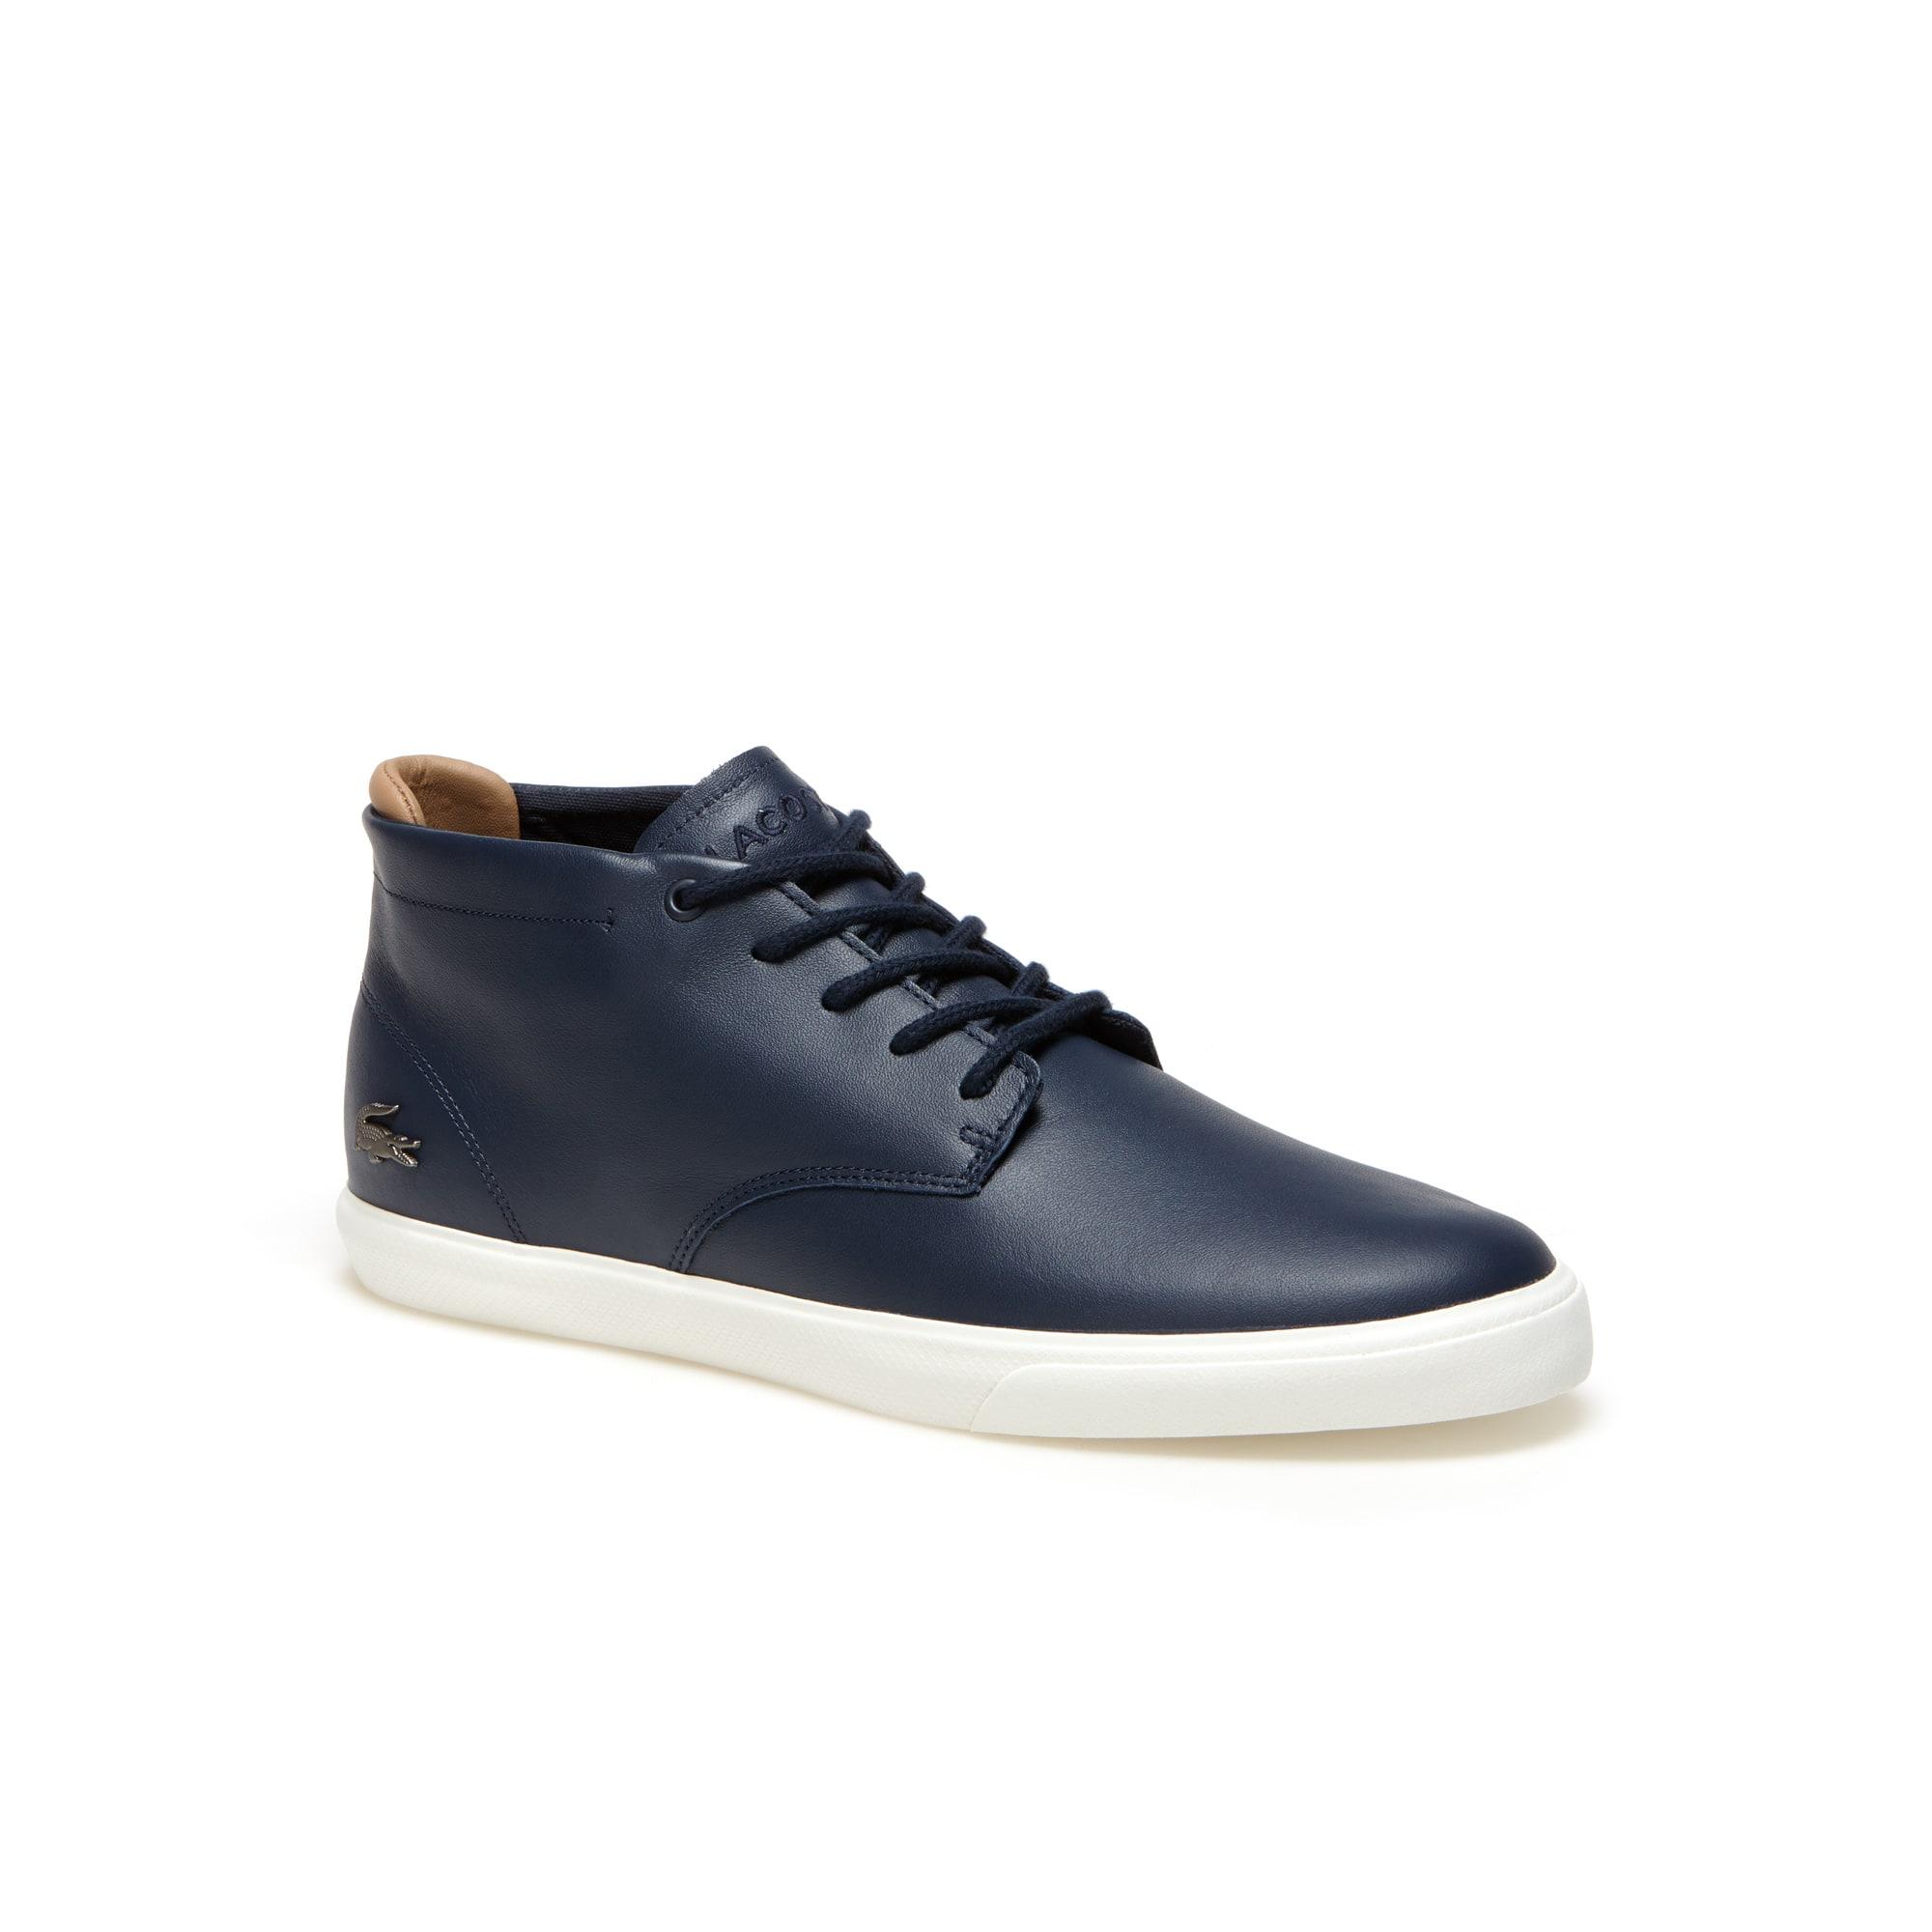 Sneakers Espere Chukka in pelle